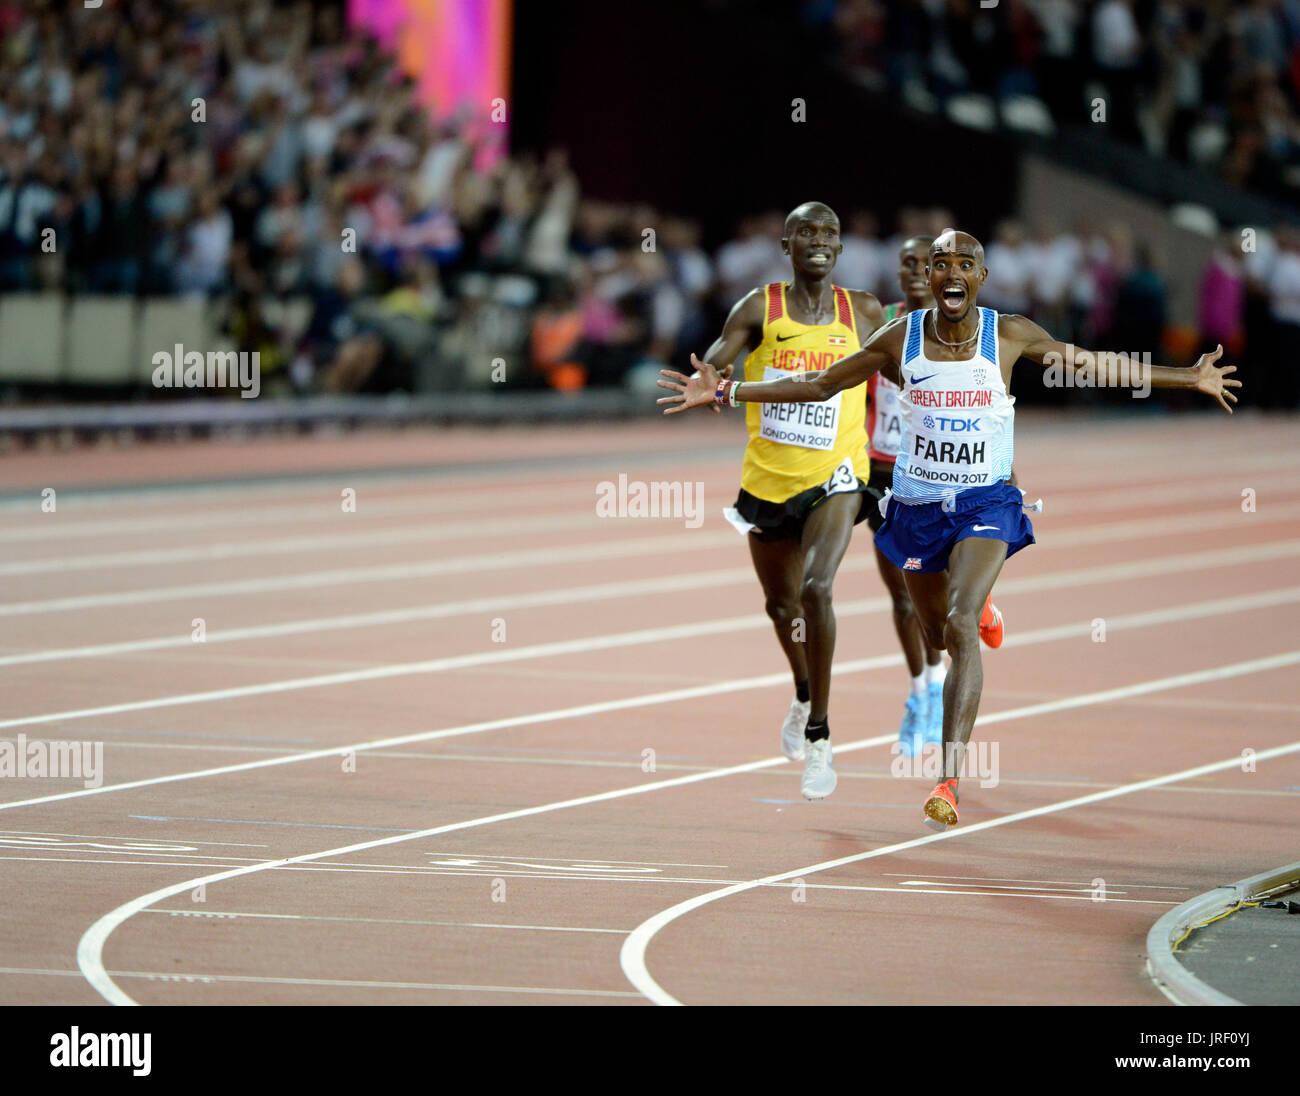 Mo Farah - IAAF World Championships London 2017 Stockbild